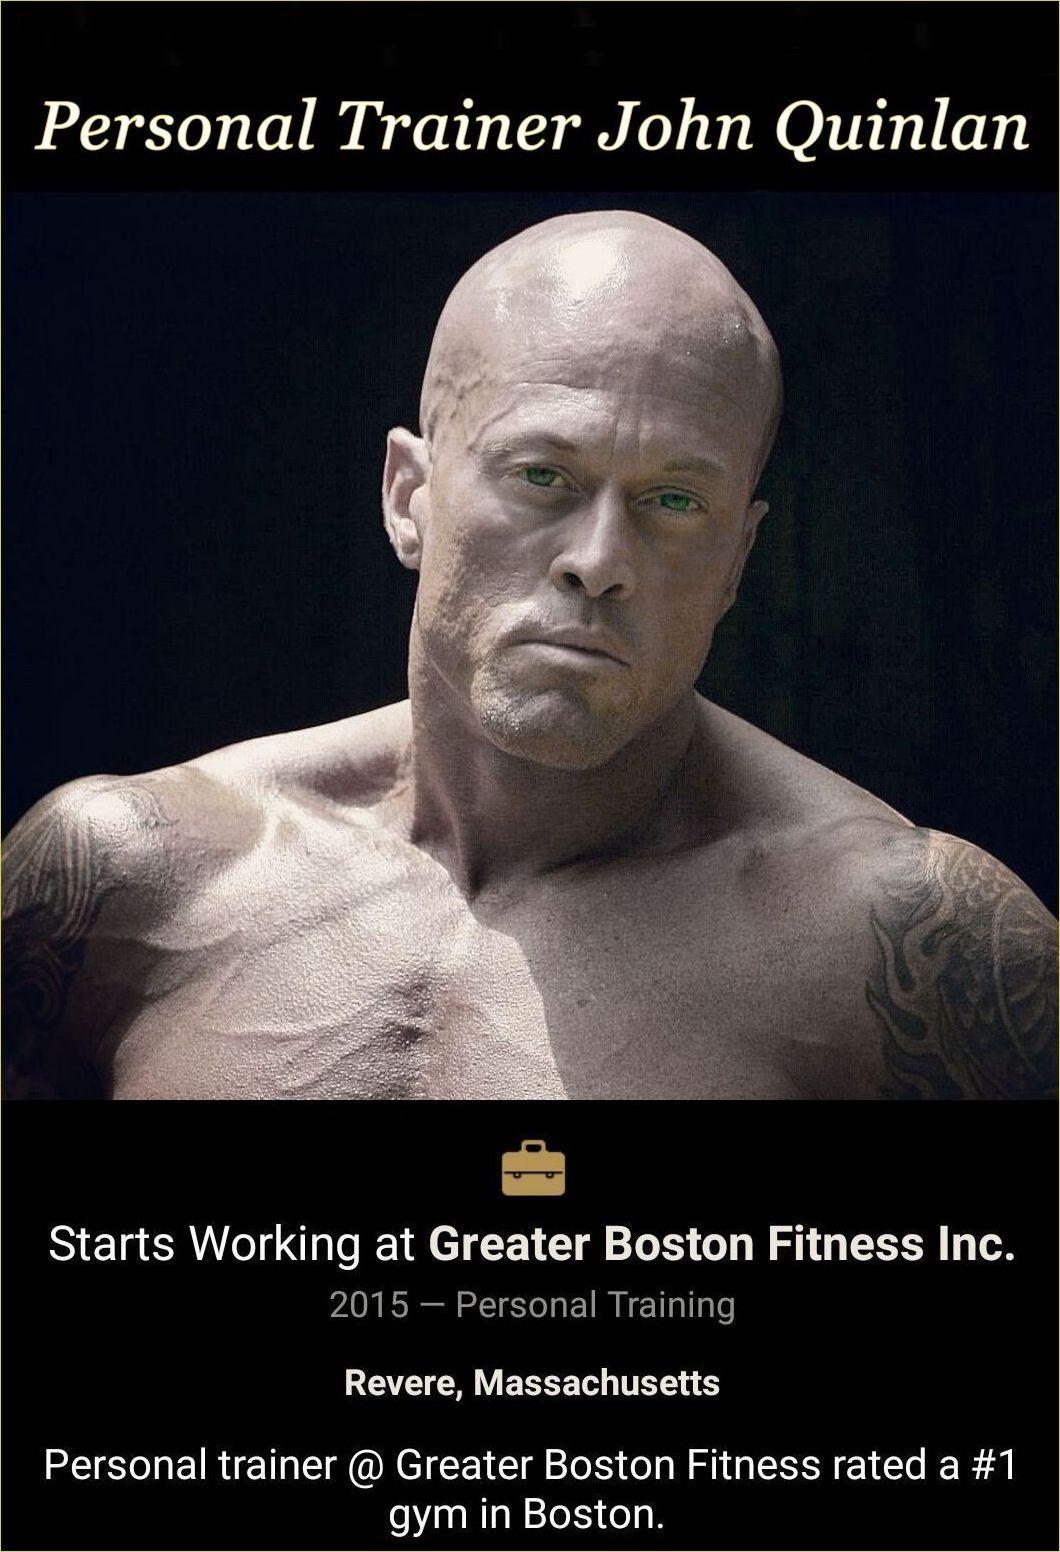 Tattooed Male Romance & Physique Model John Joseph Quinlan Personal Trainer @ Greater Boston Fitness #JohnQuinlan